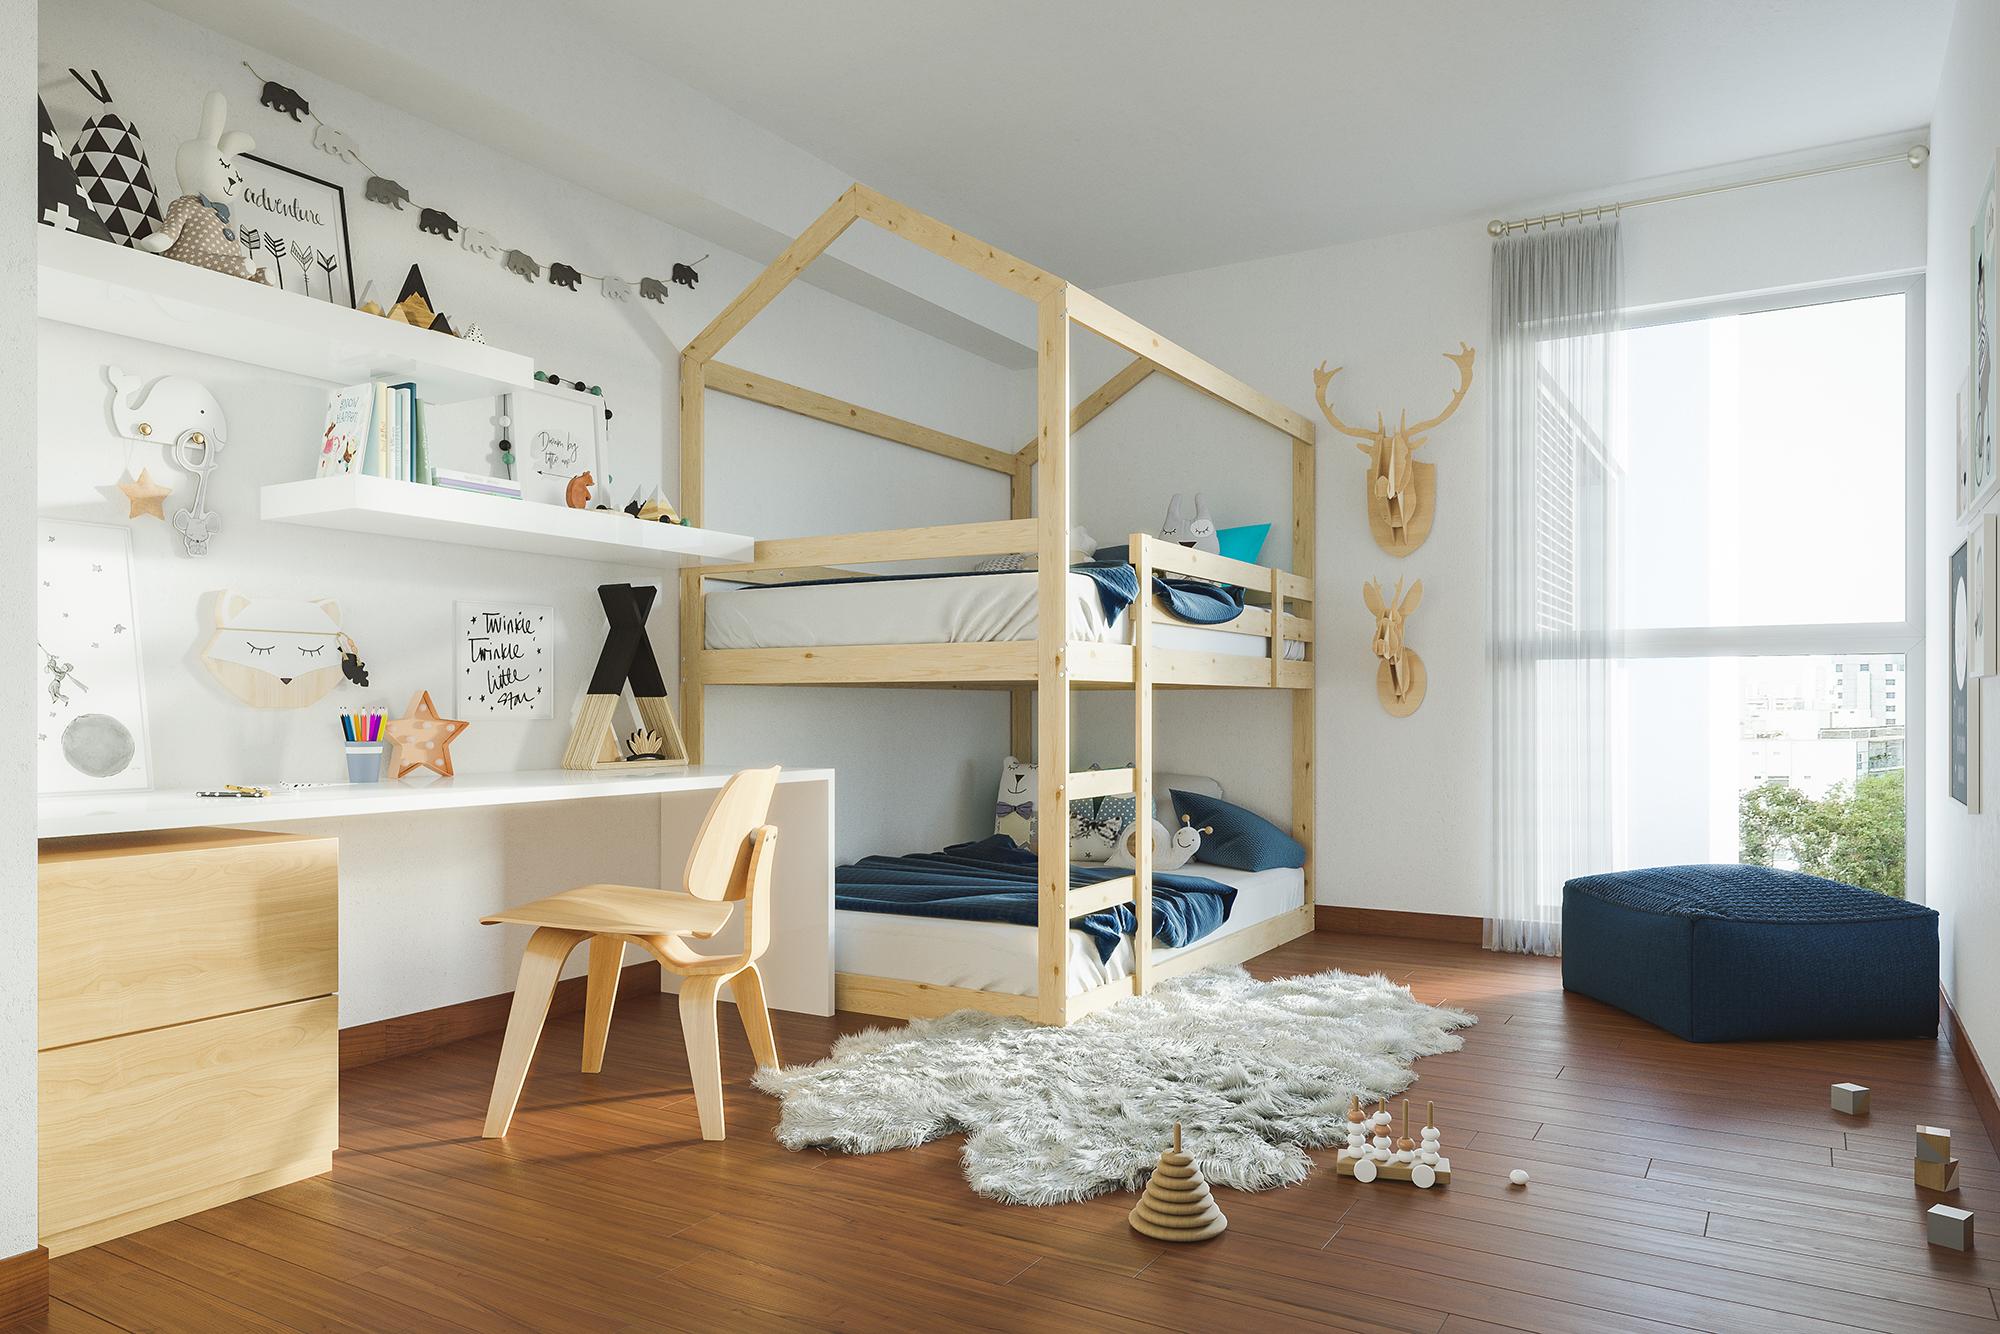 AV_EUCALIPTOS_Dormitorio_Niños